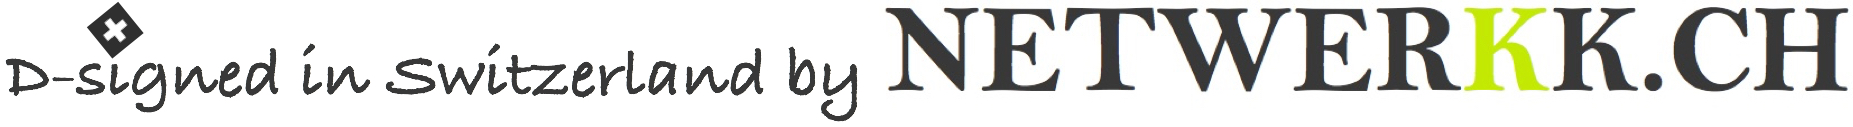 Netwerkk.ch Logo